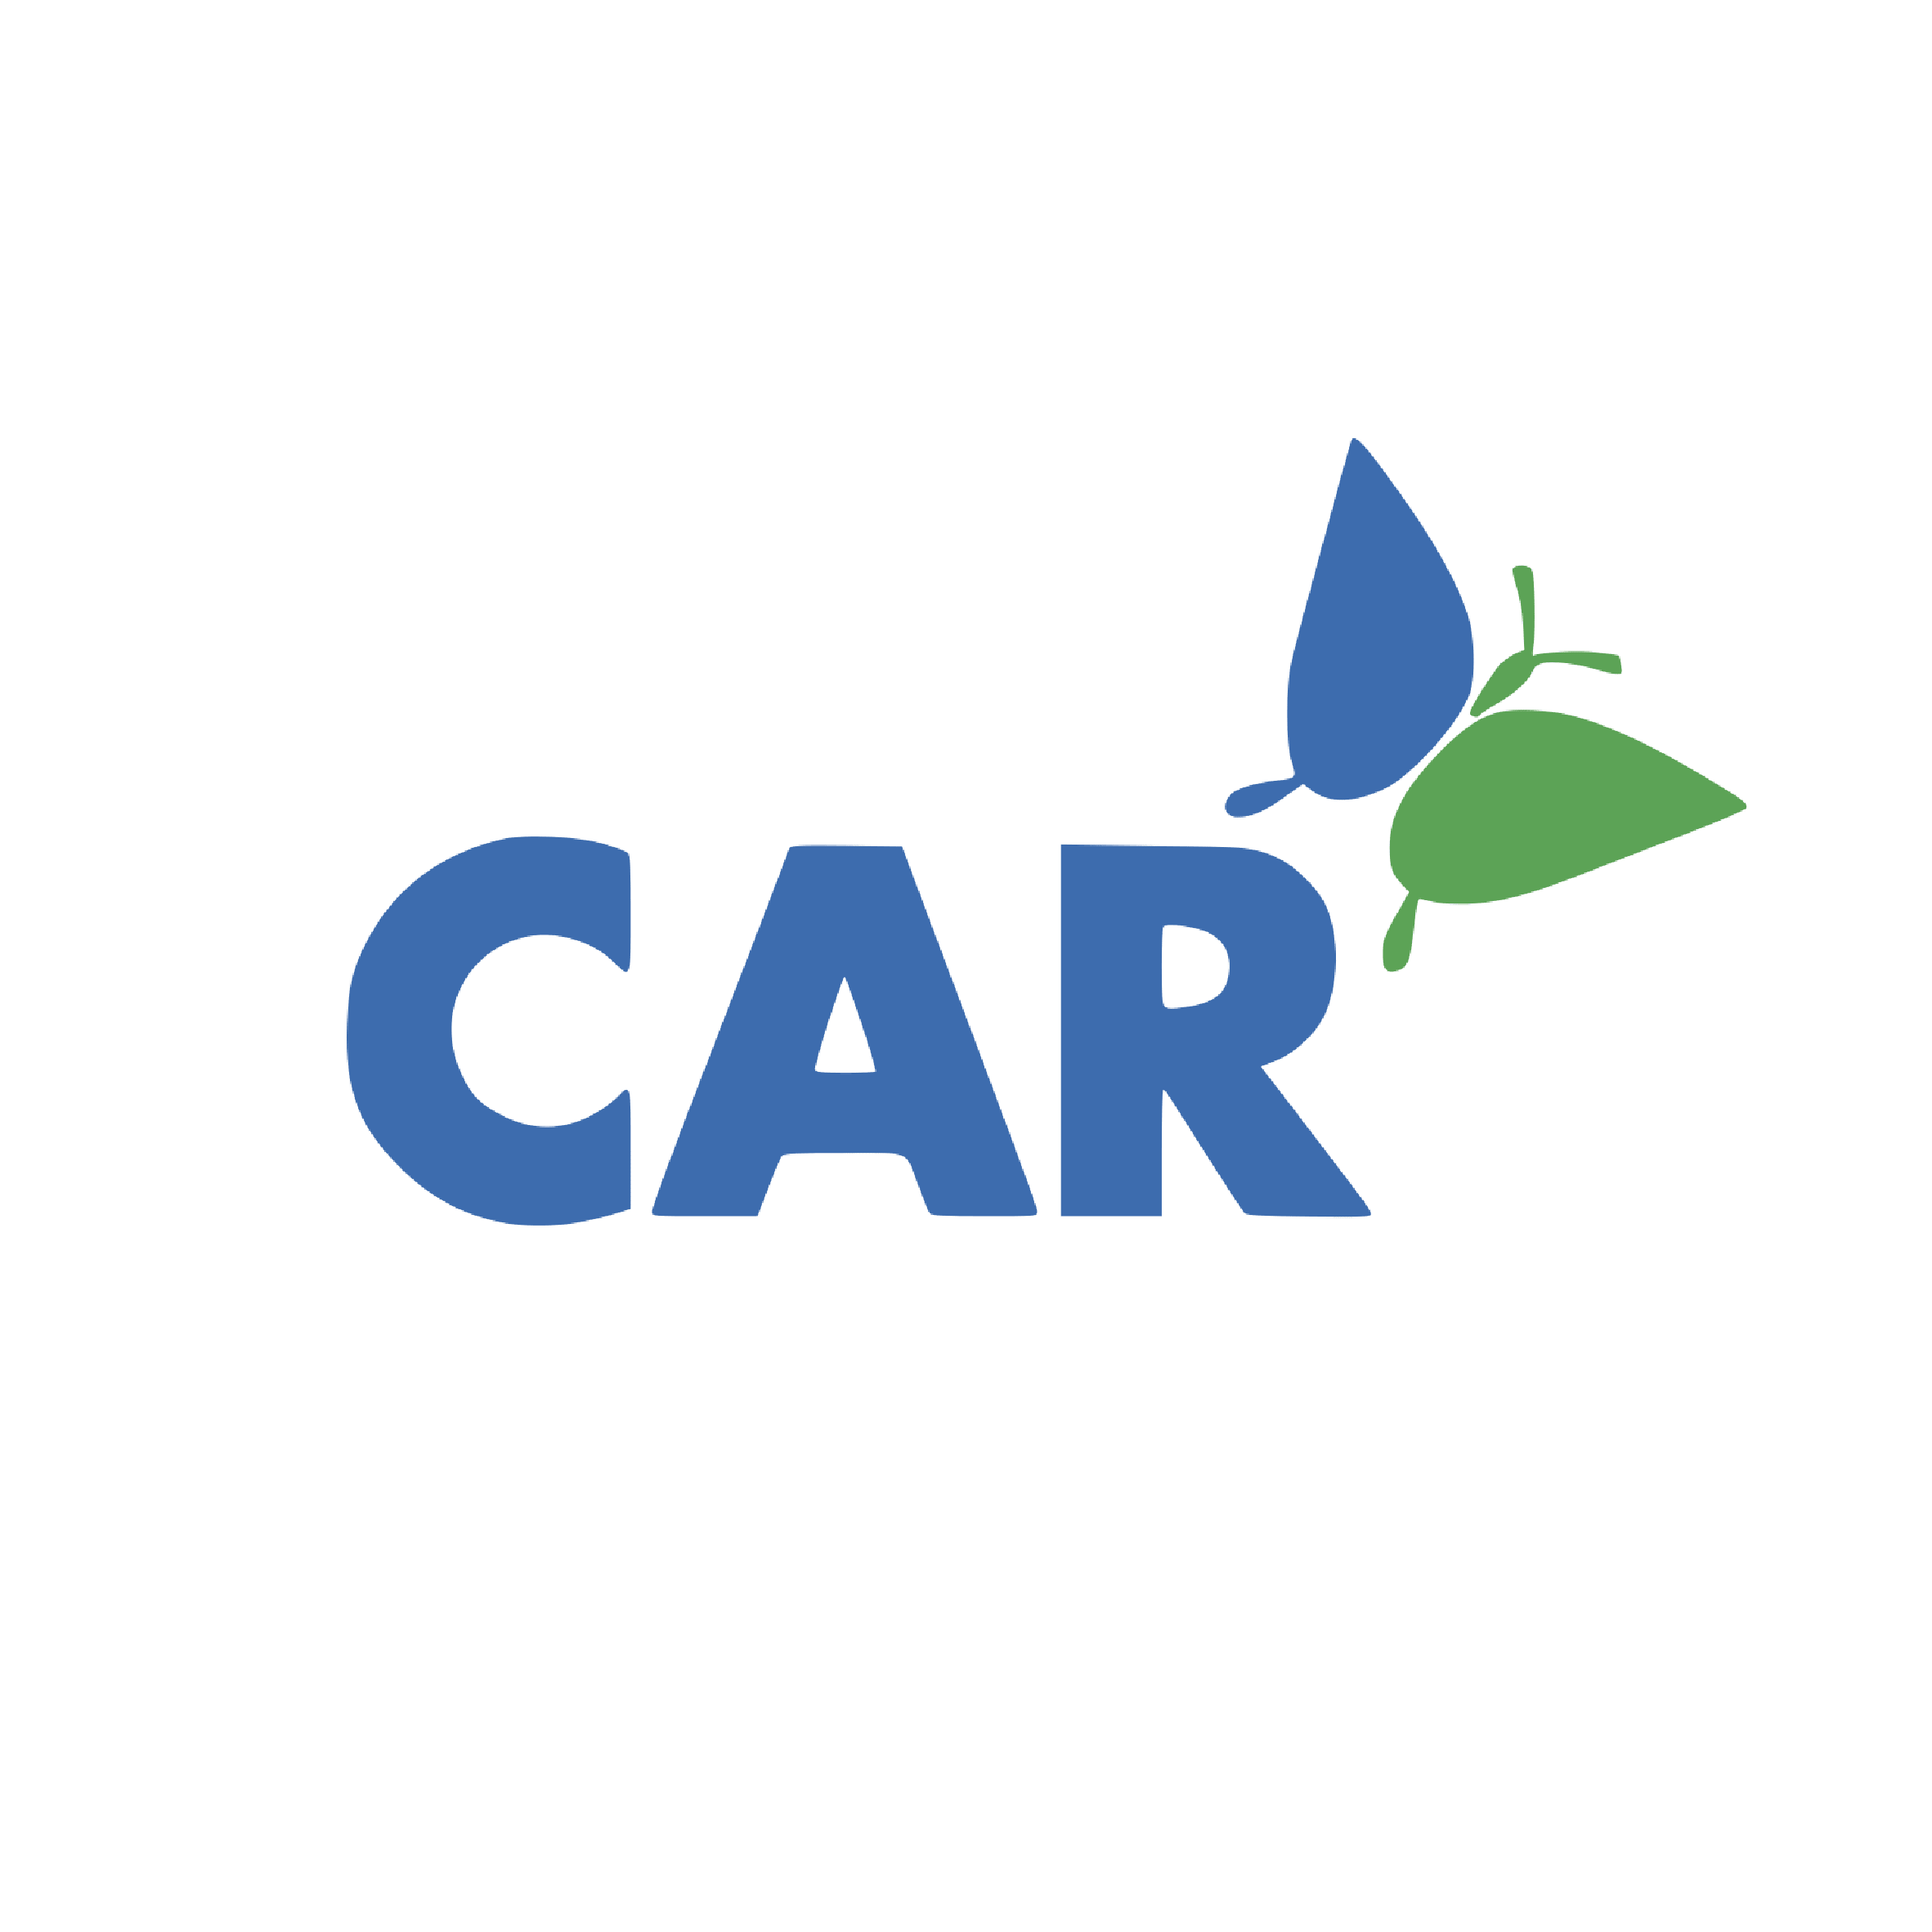 Responsabilidad Ambiental- CAR